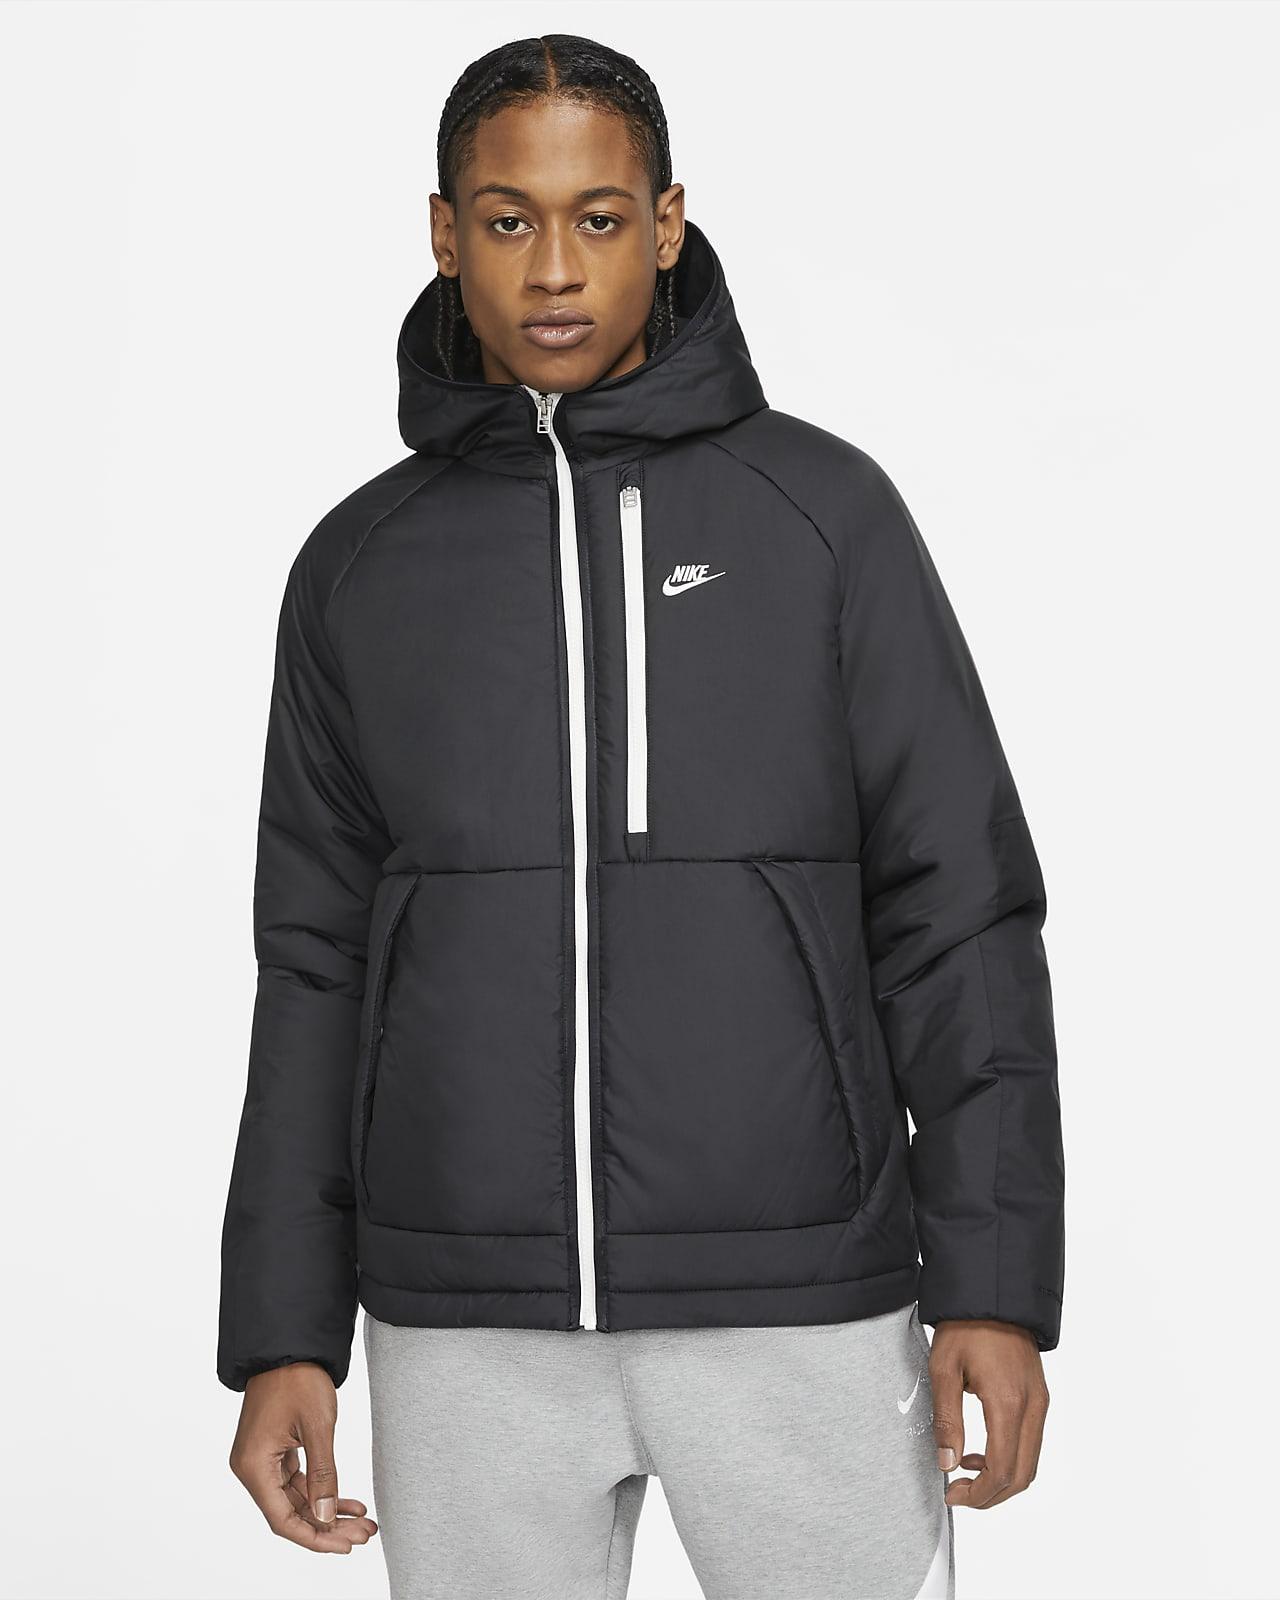 Casaco com capuz Nike Sportswear Therma-FIT Legacy para homem